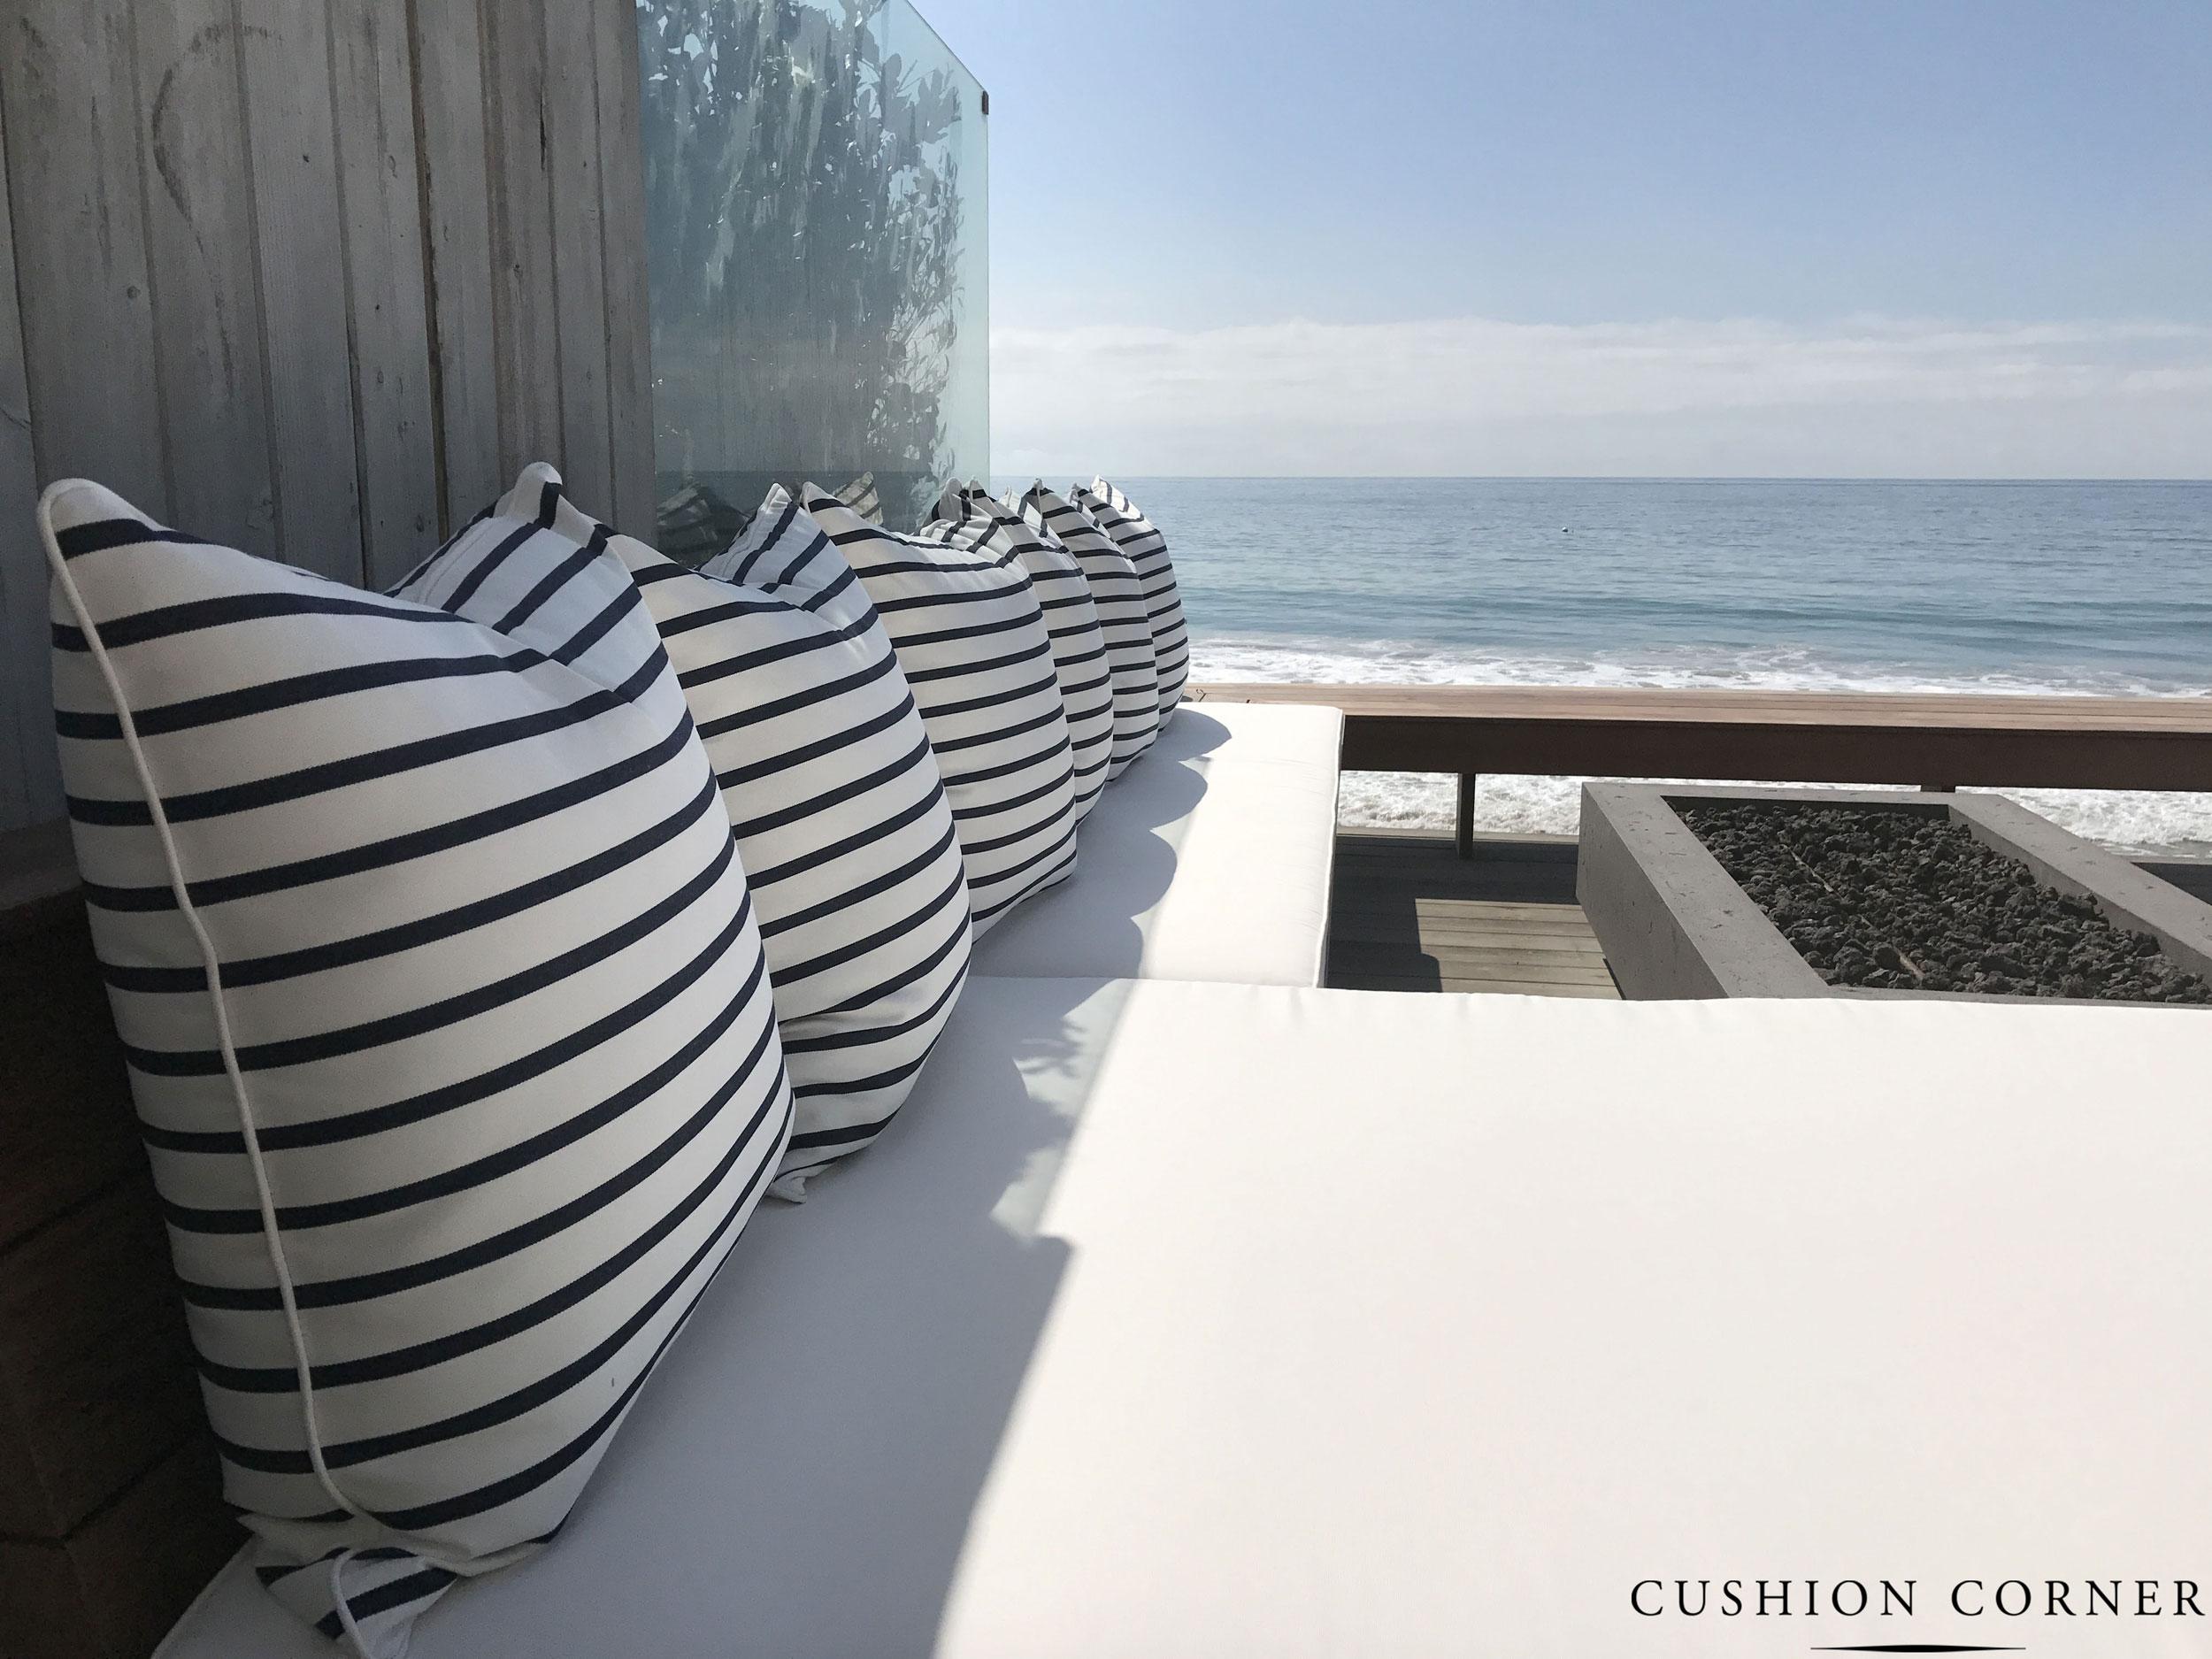 Gallery Cushion Corner